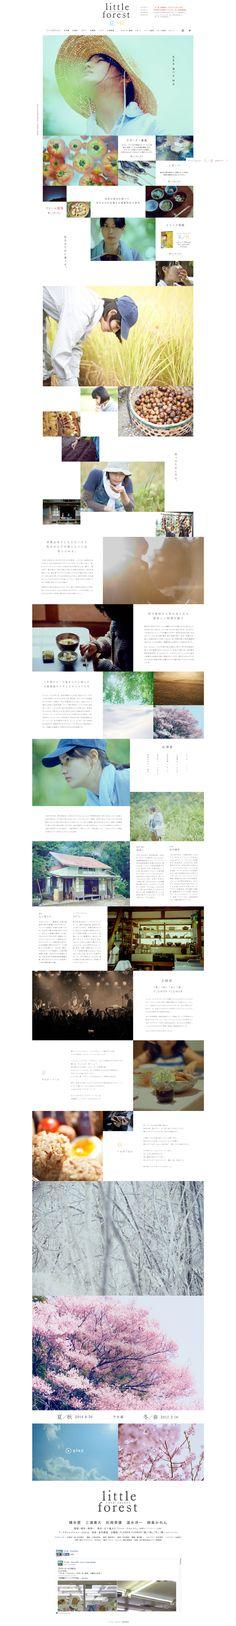 http://littleforest-movie.jp/sa/ 映画 『リトル・フォレスト』